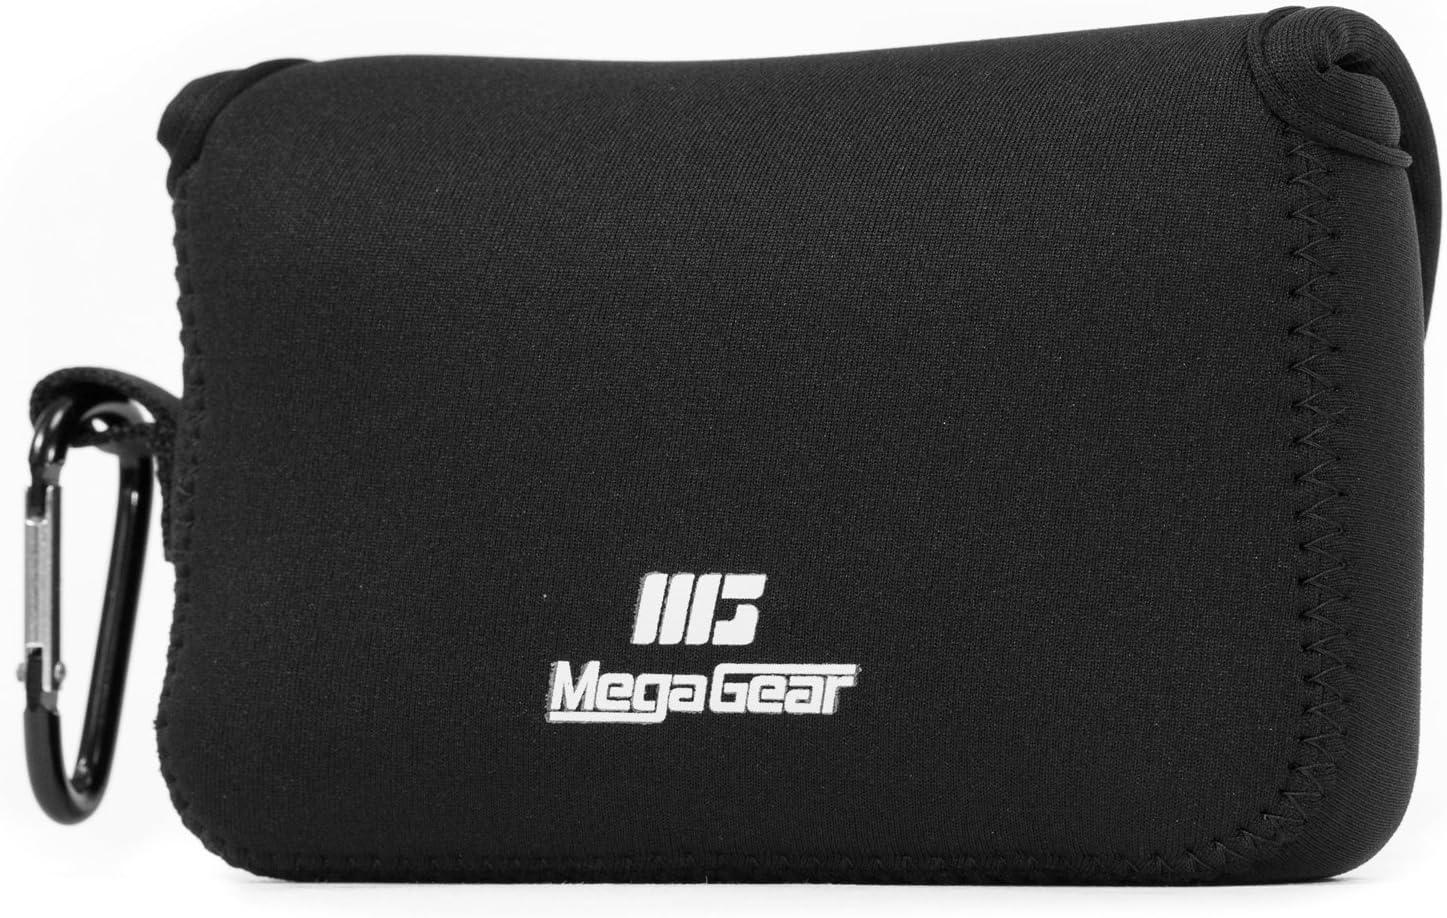 Amazon.com: MegaGear – Canon PowerShot G1 X Mark III ULTRA ...